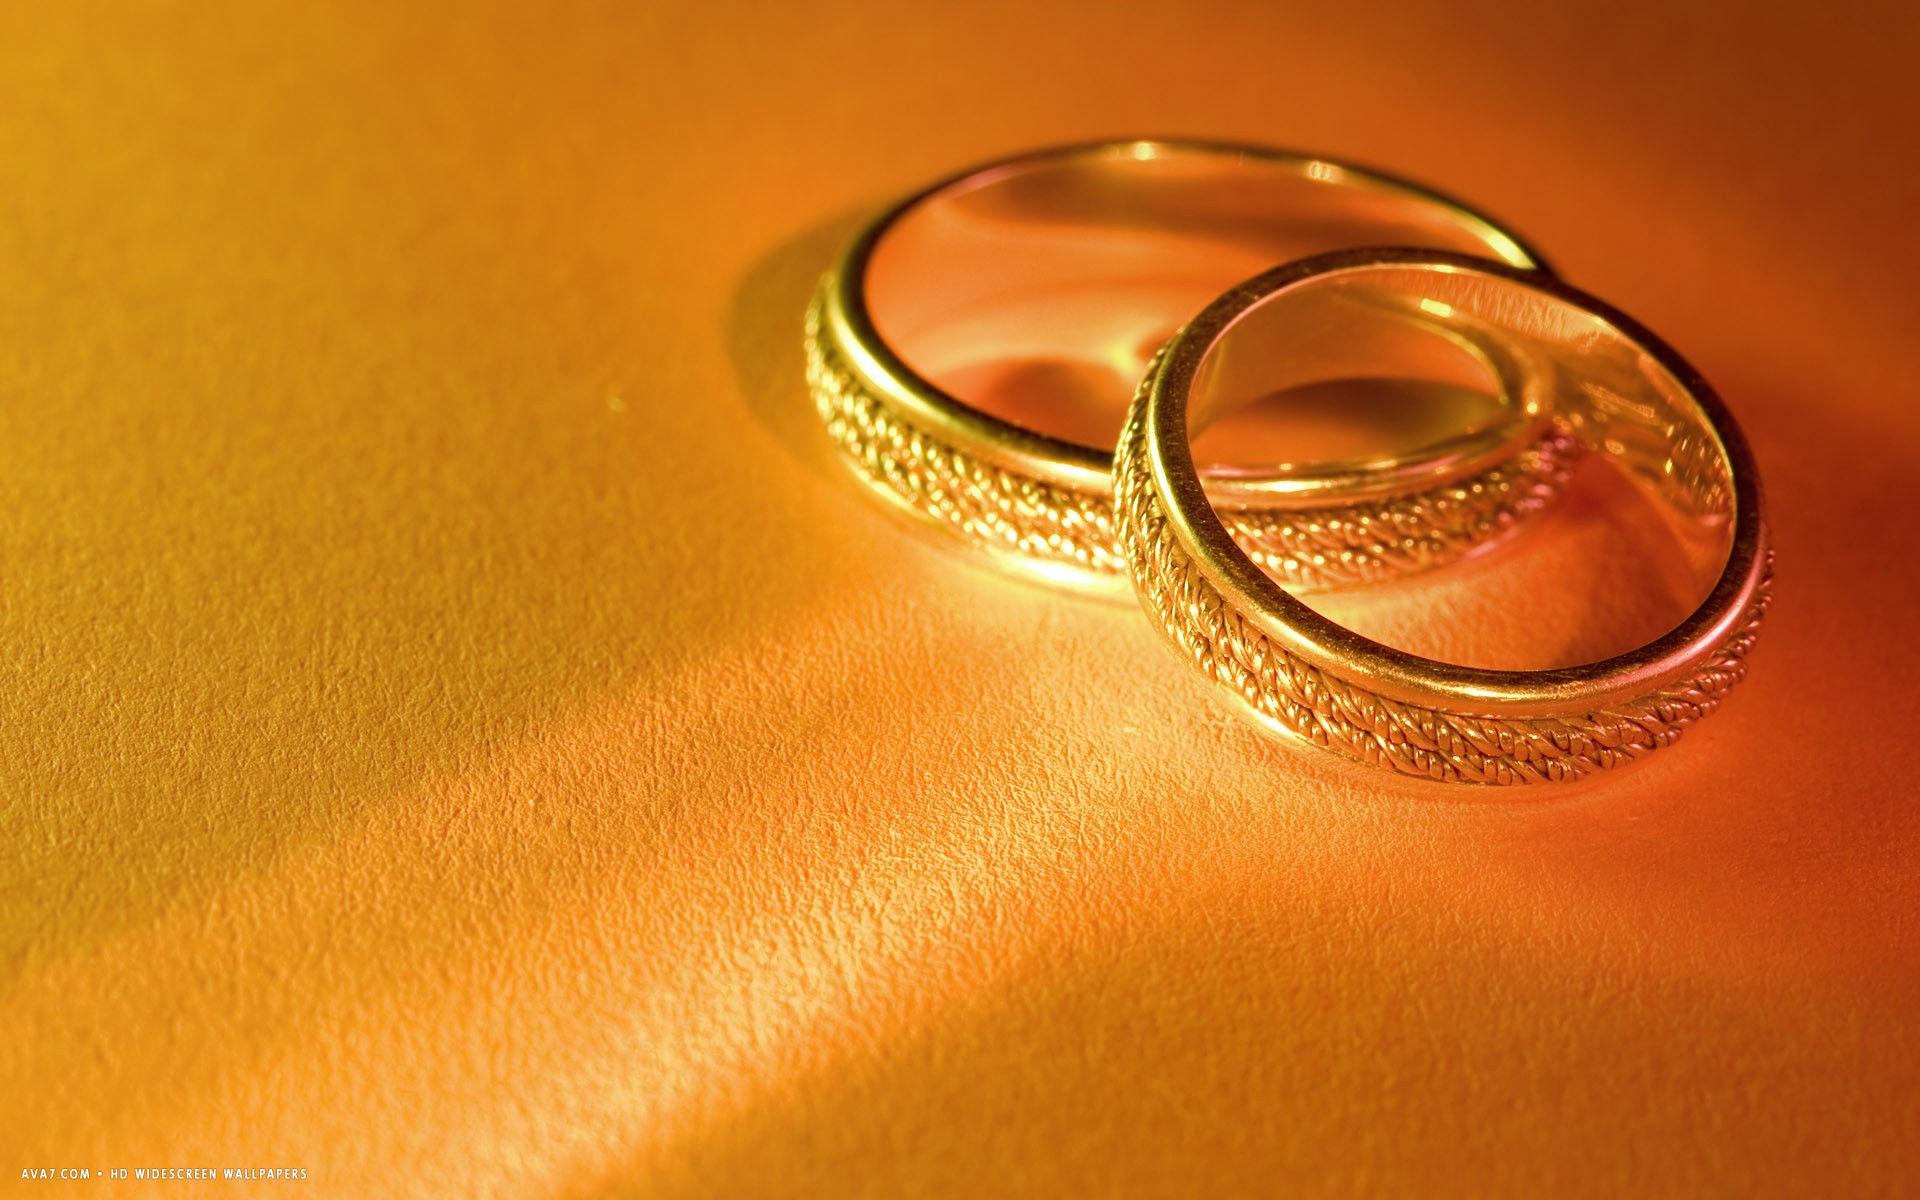 wedding ring hands marriage wife husband bride groom hd widescreen